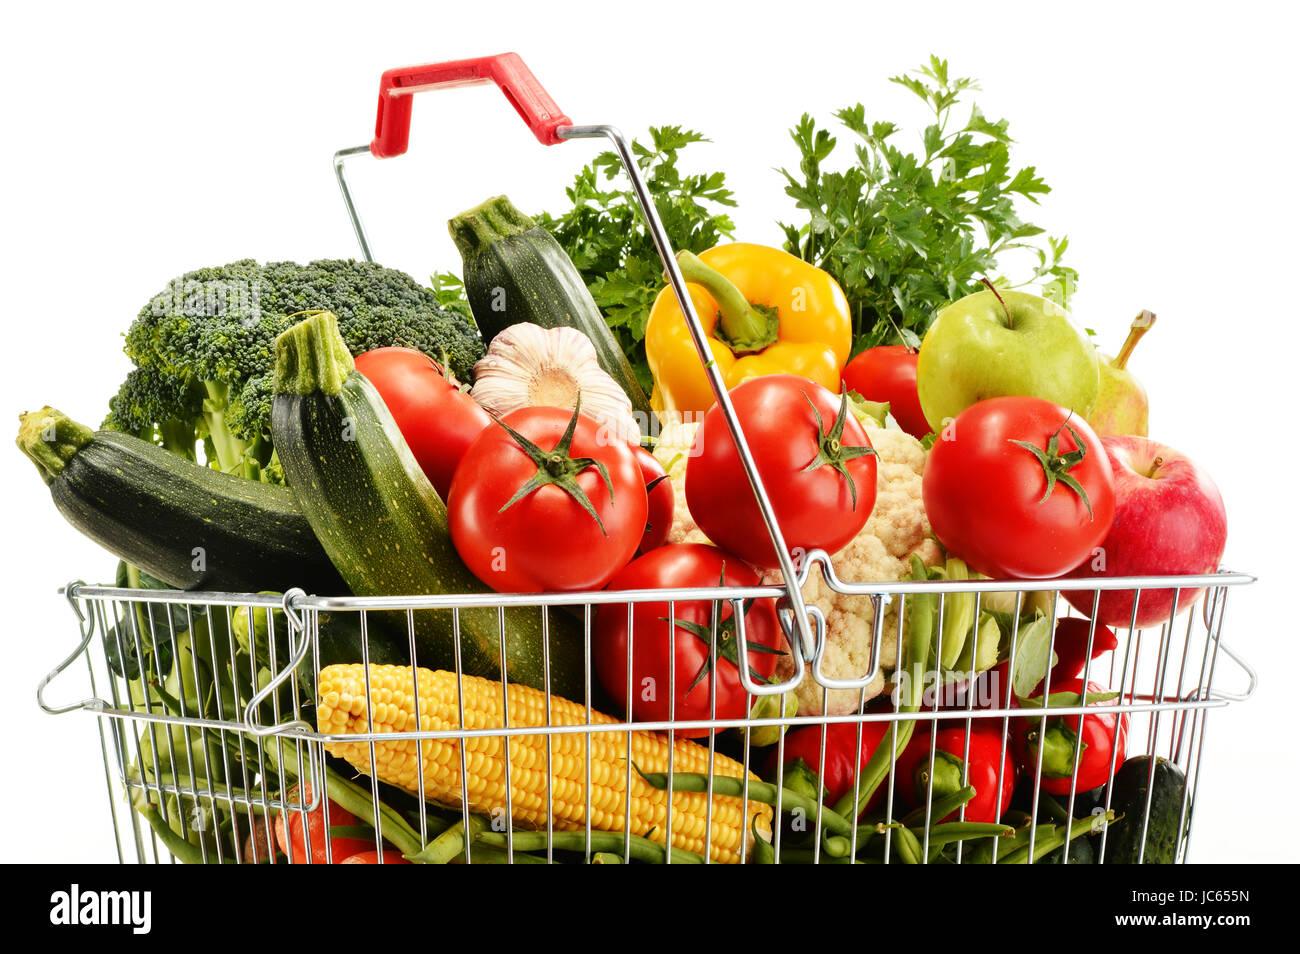 Zucchini Stockfotos & Zucchini Bilder - Seite 105 - Alamy